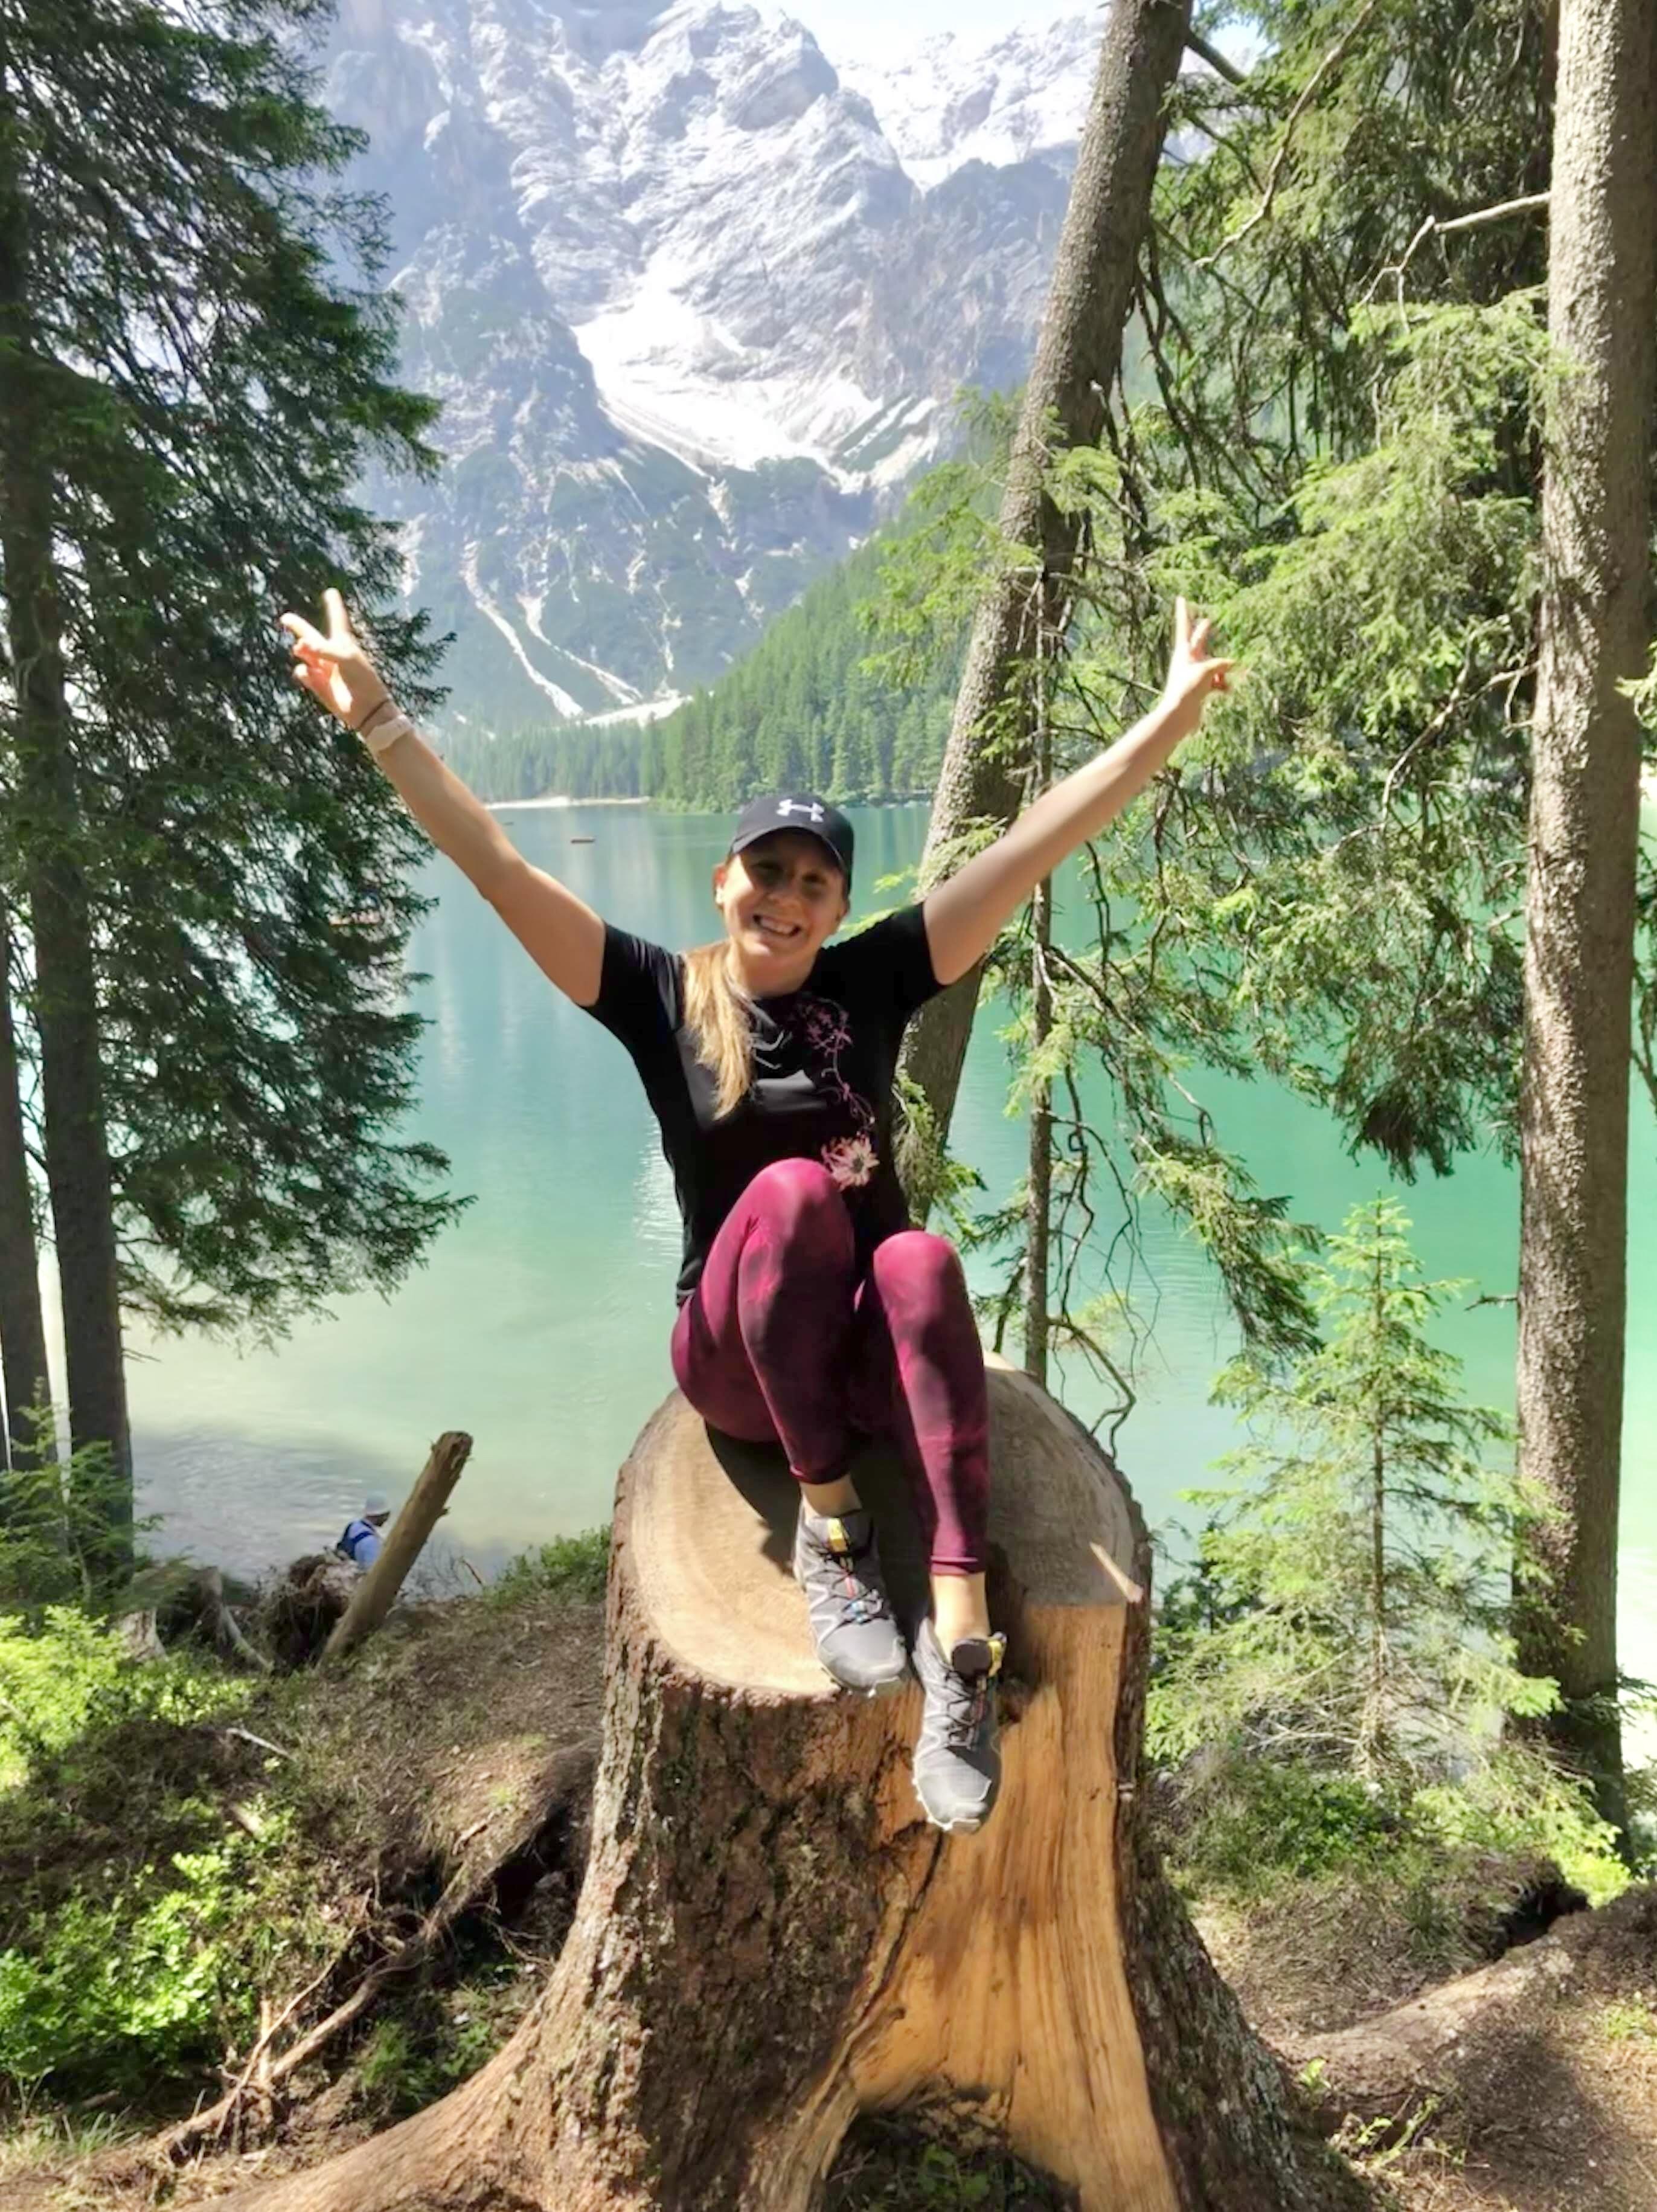 Elisabetta Brigo, the Physio Formula, Physiotherapy, physio, Physiotherapist, health, pain, wellbeing, fitness